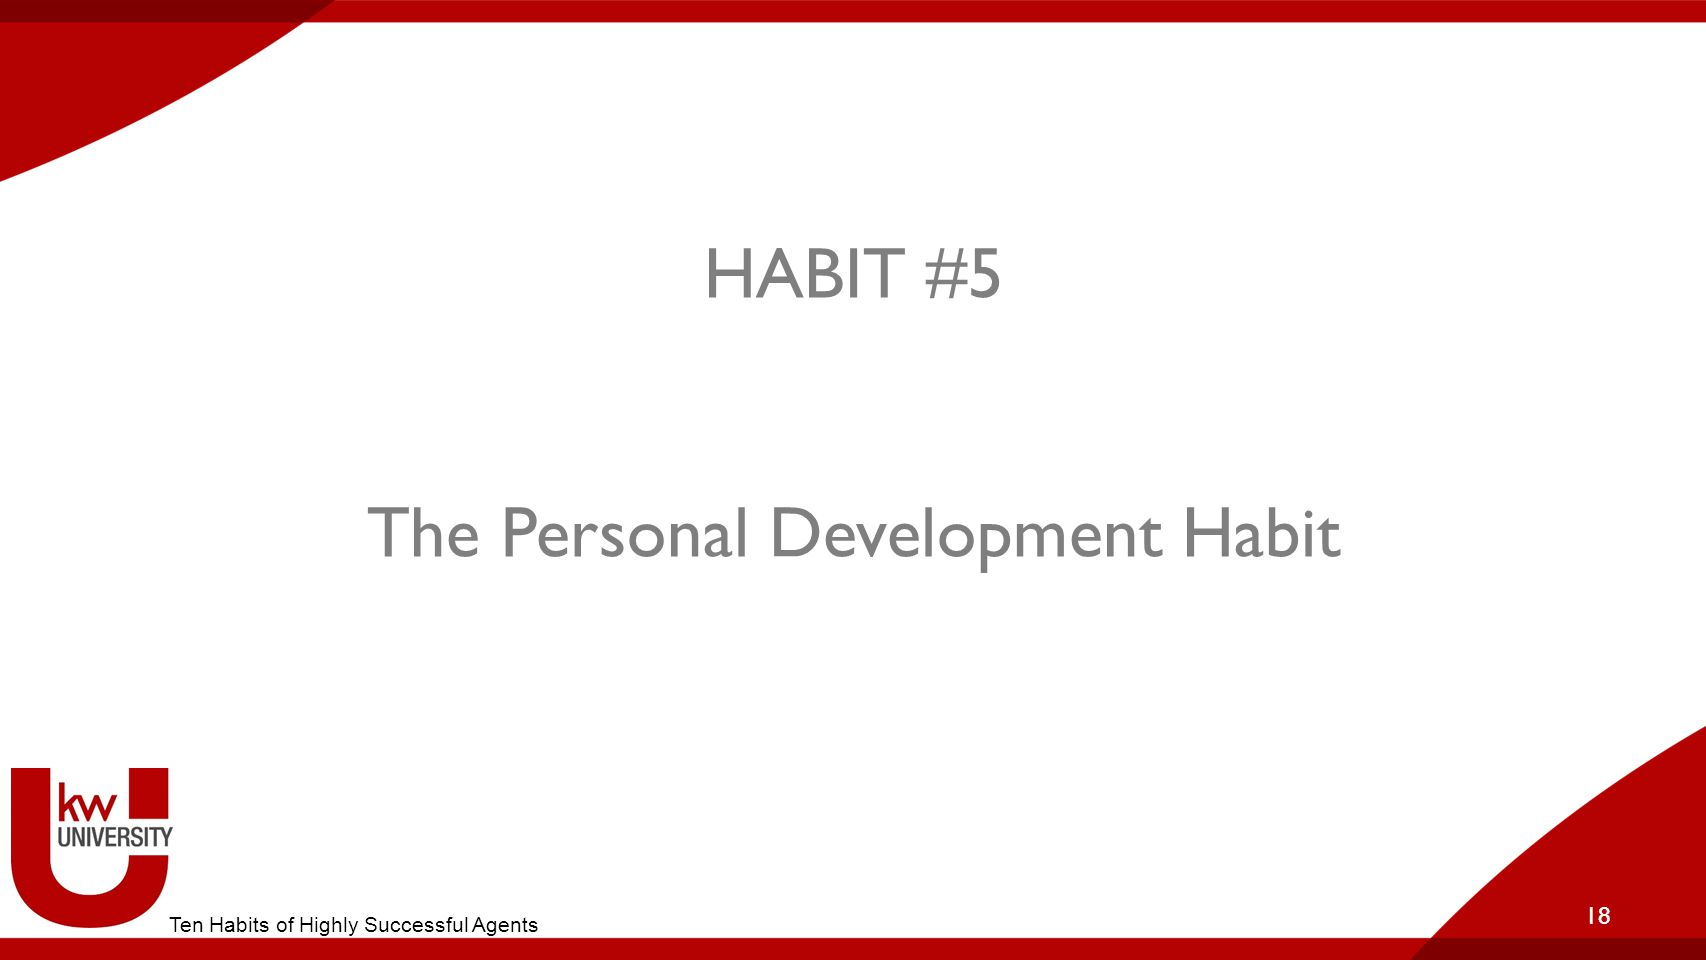 HABIT #5 The Personal Development Habit